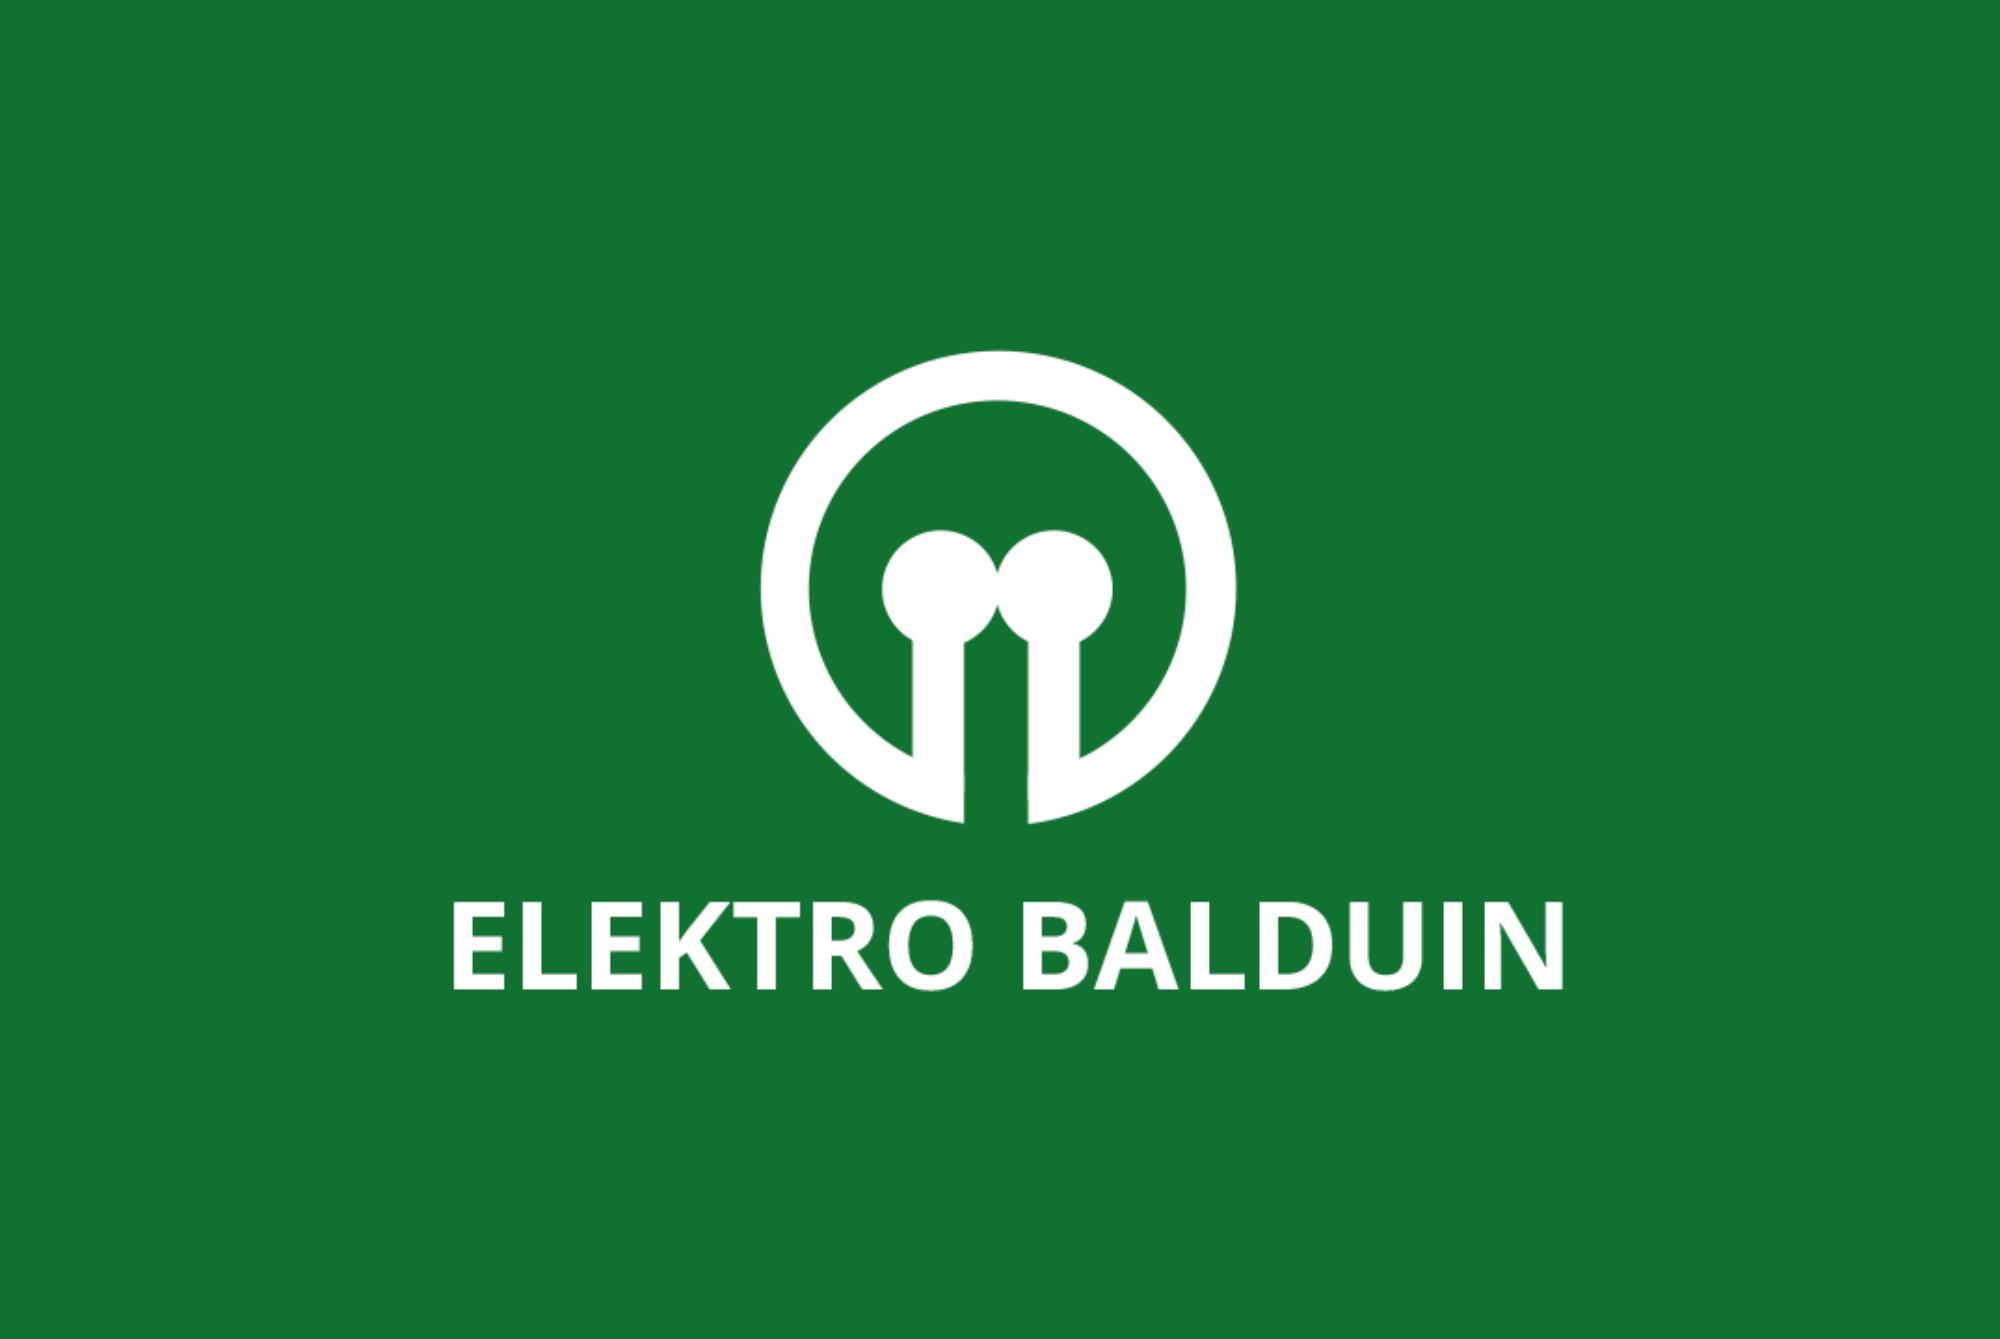 www.elektro-balduin.de